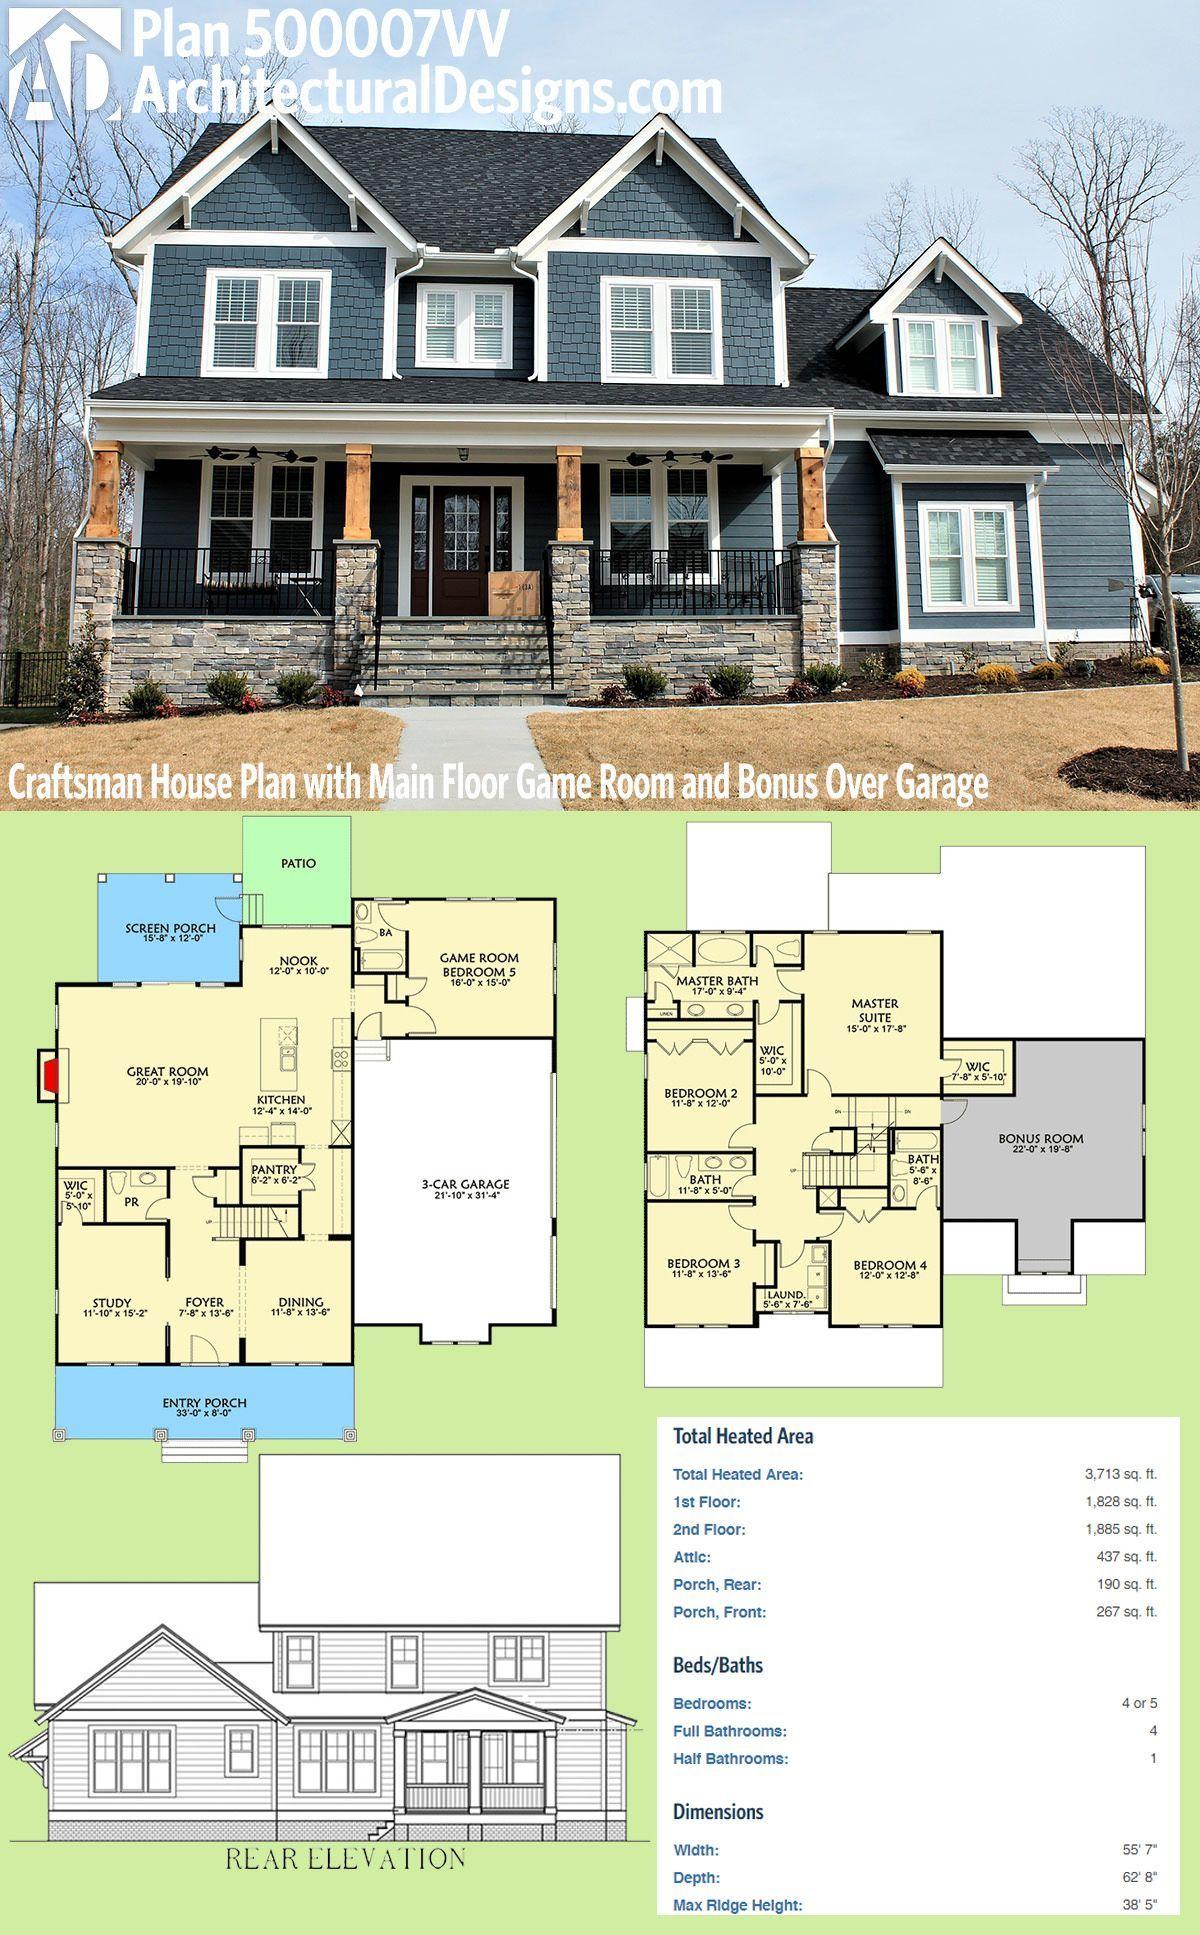 Plan 500007vv Craftsman House Plan With Main Floor Game Room And Bonus Over Garage Craftsman House Plans Craftsman House Plan Dream House Plans